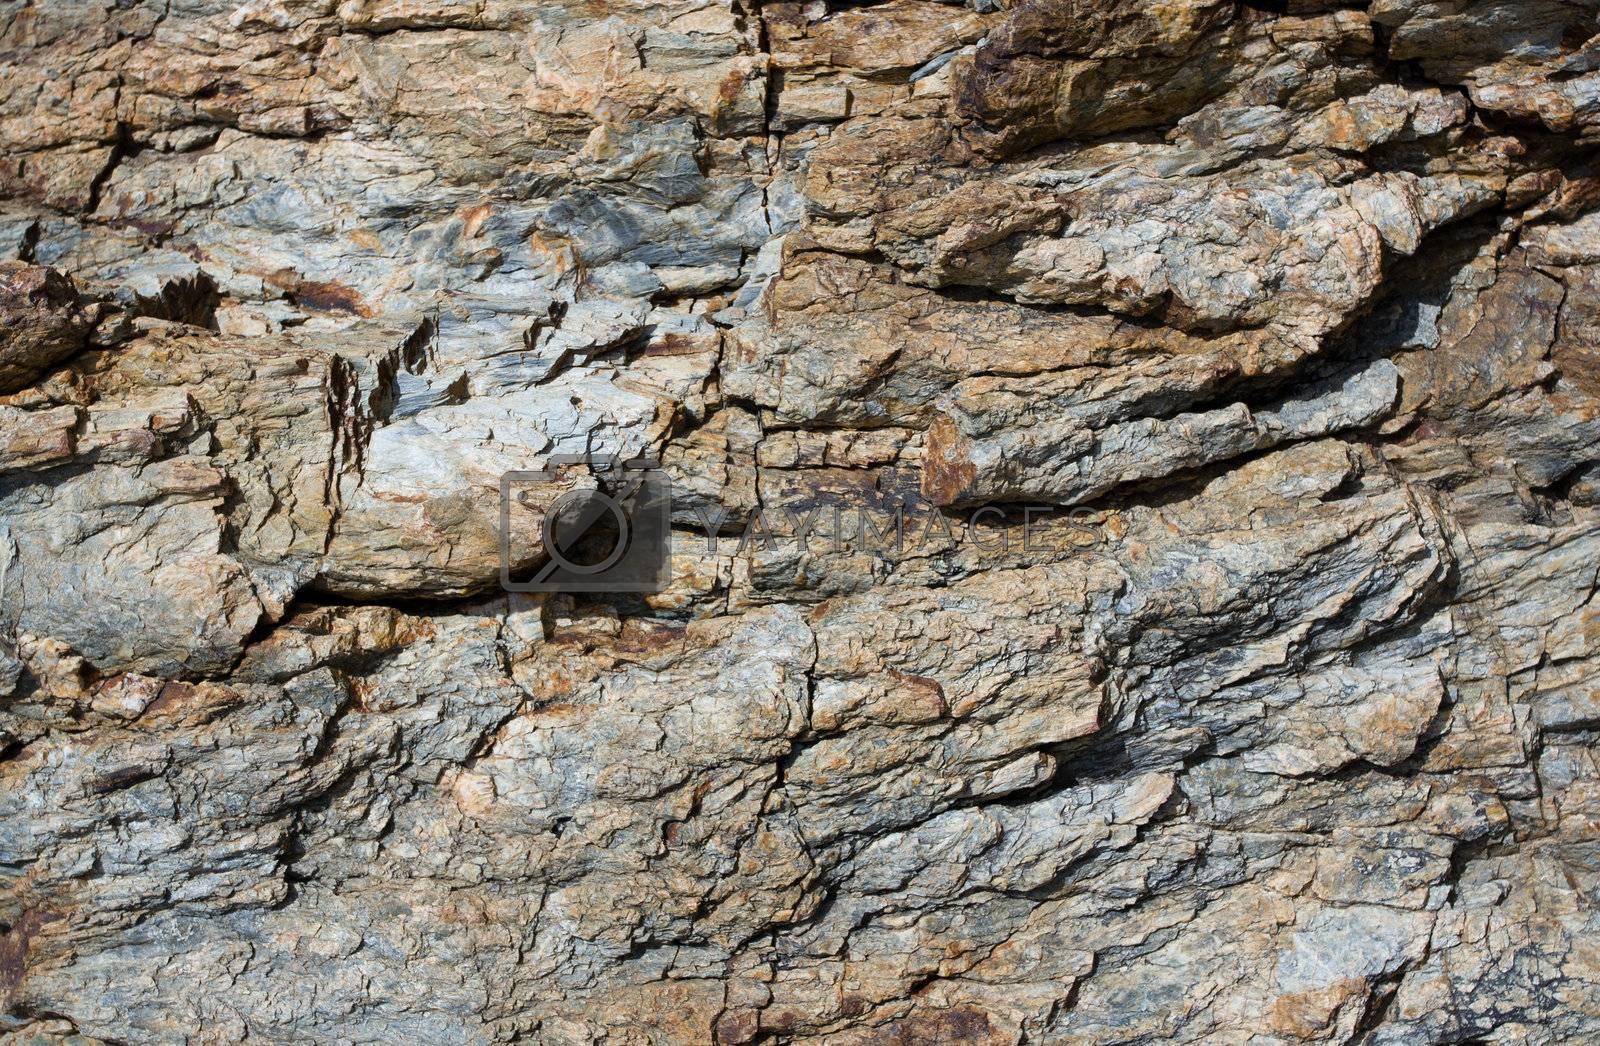 Rock stone pattern, textured backgrounds by SergeyAK